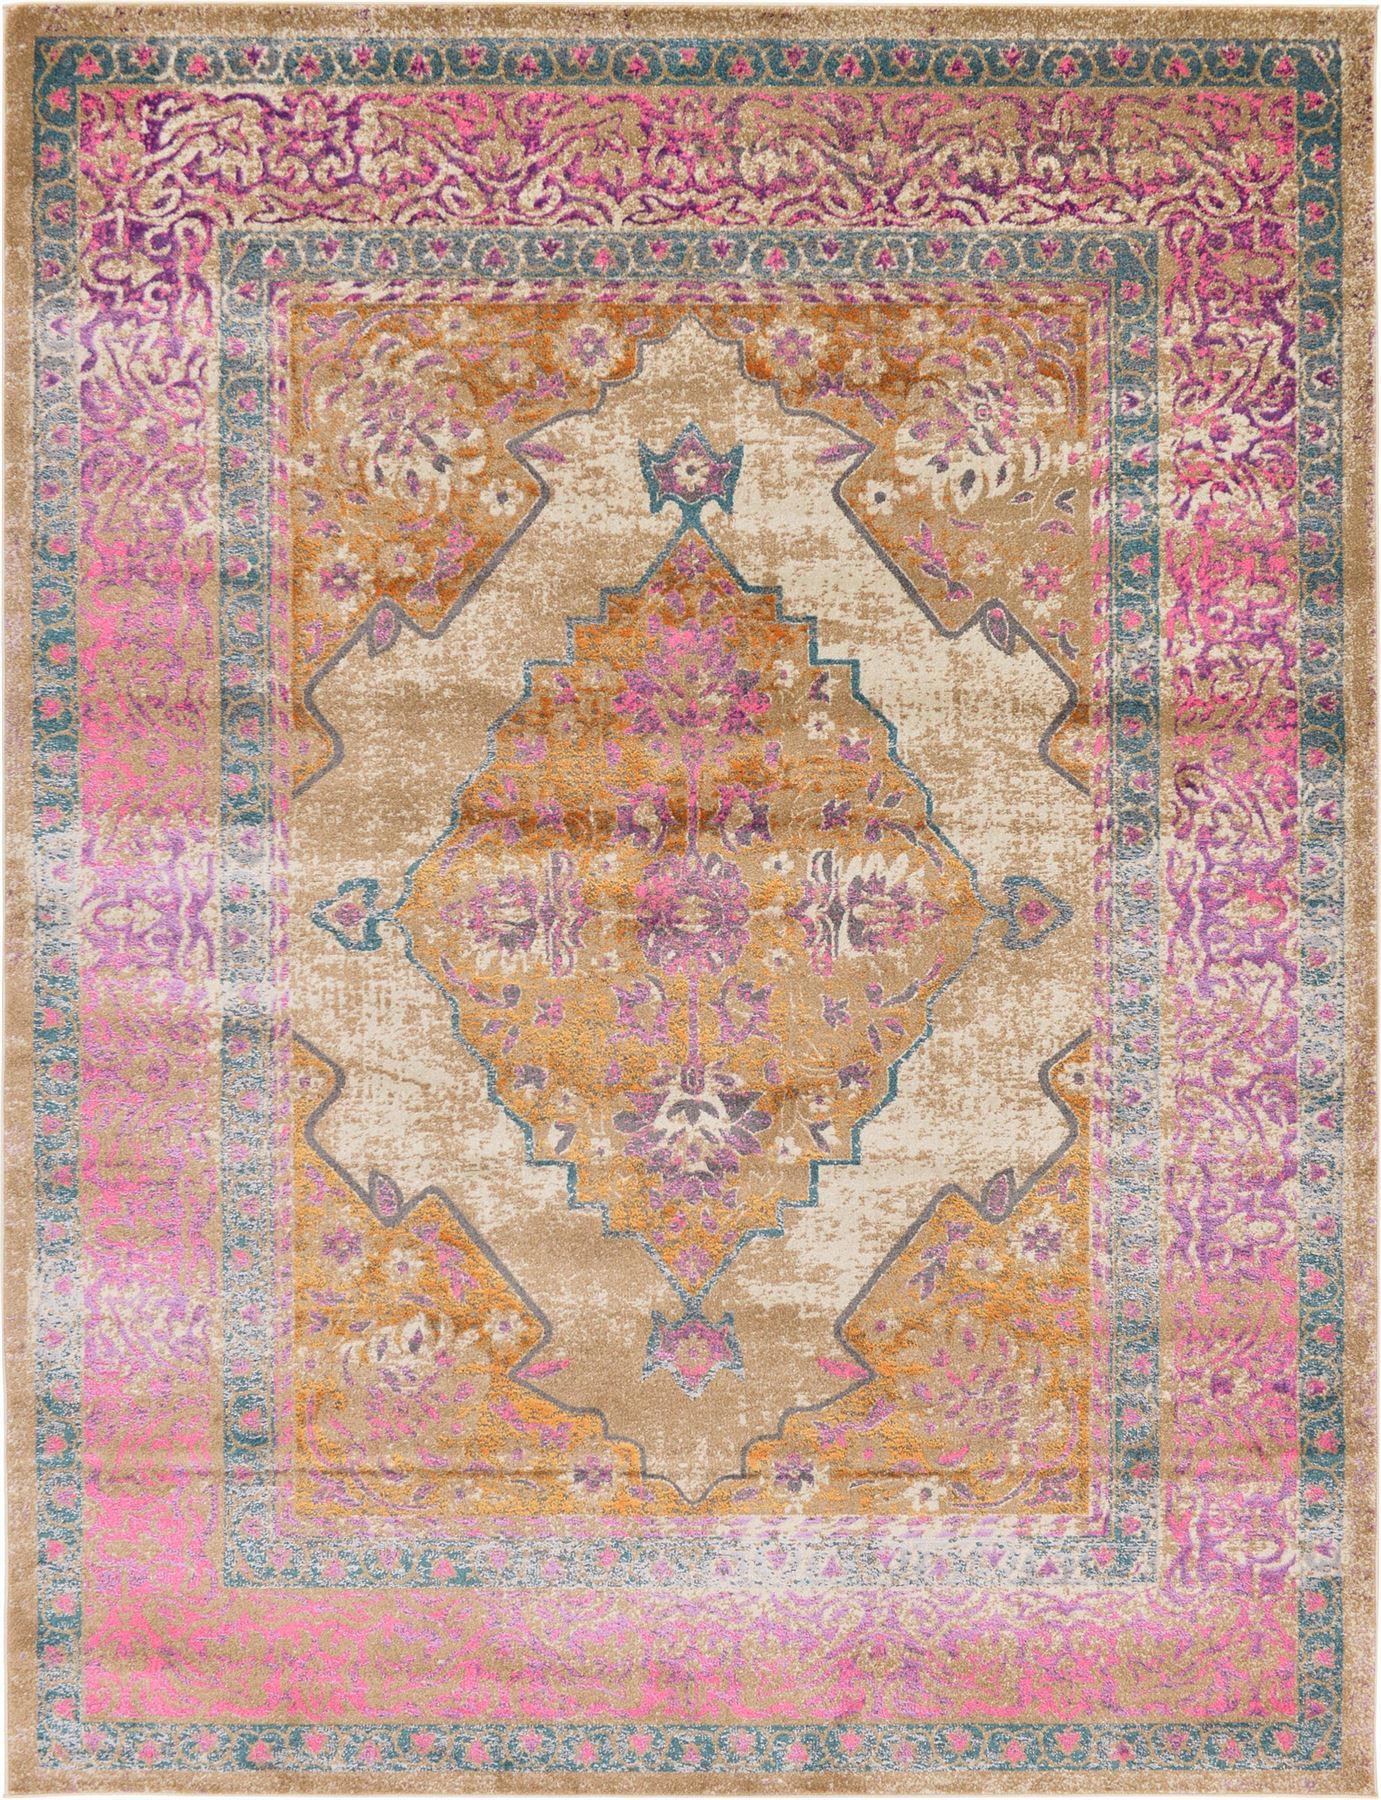 Oriental Rugs Modern Carpets New Rug Floor Carpets Area Rug | eBay